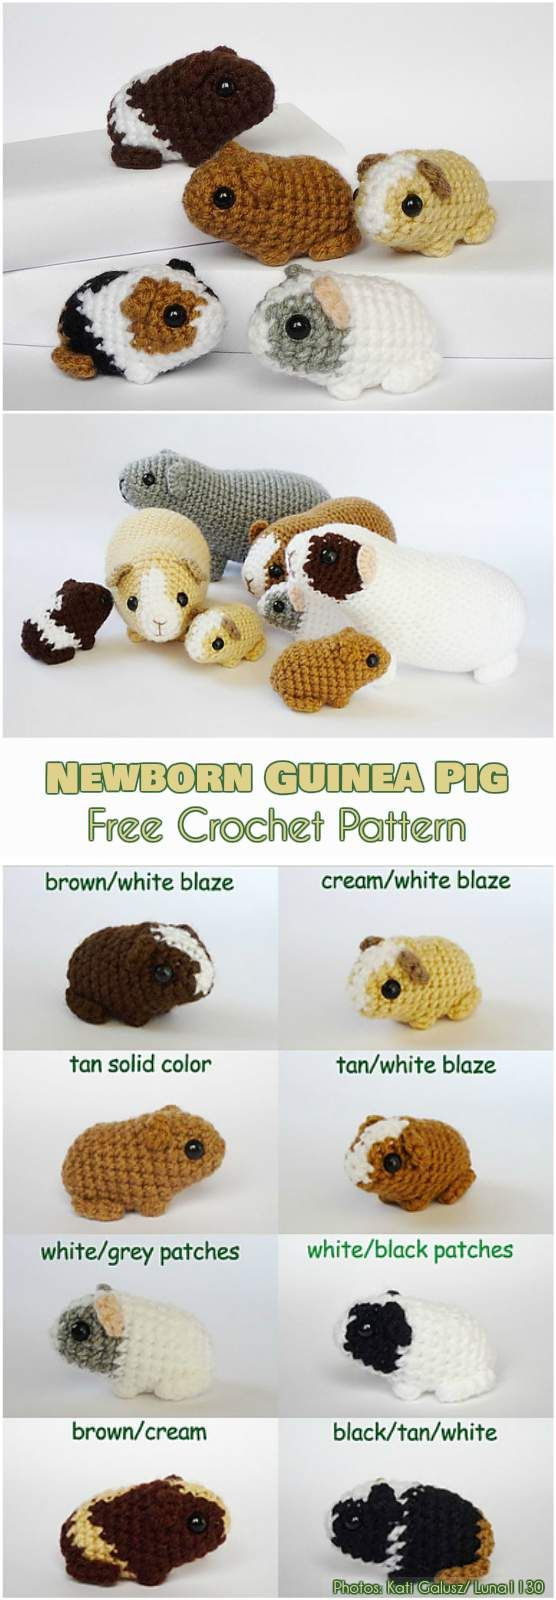 Newborn Guinea Pig Free Pattern Amigurumi Free Pattern Pinterest